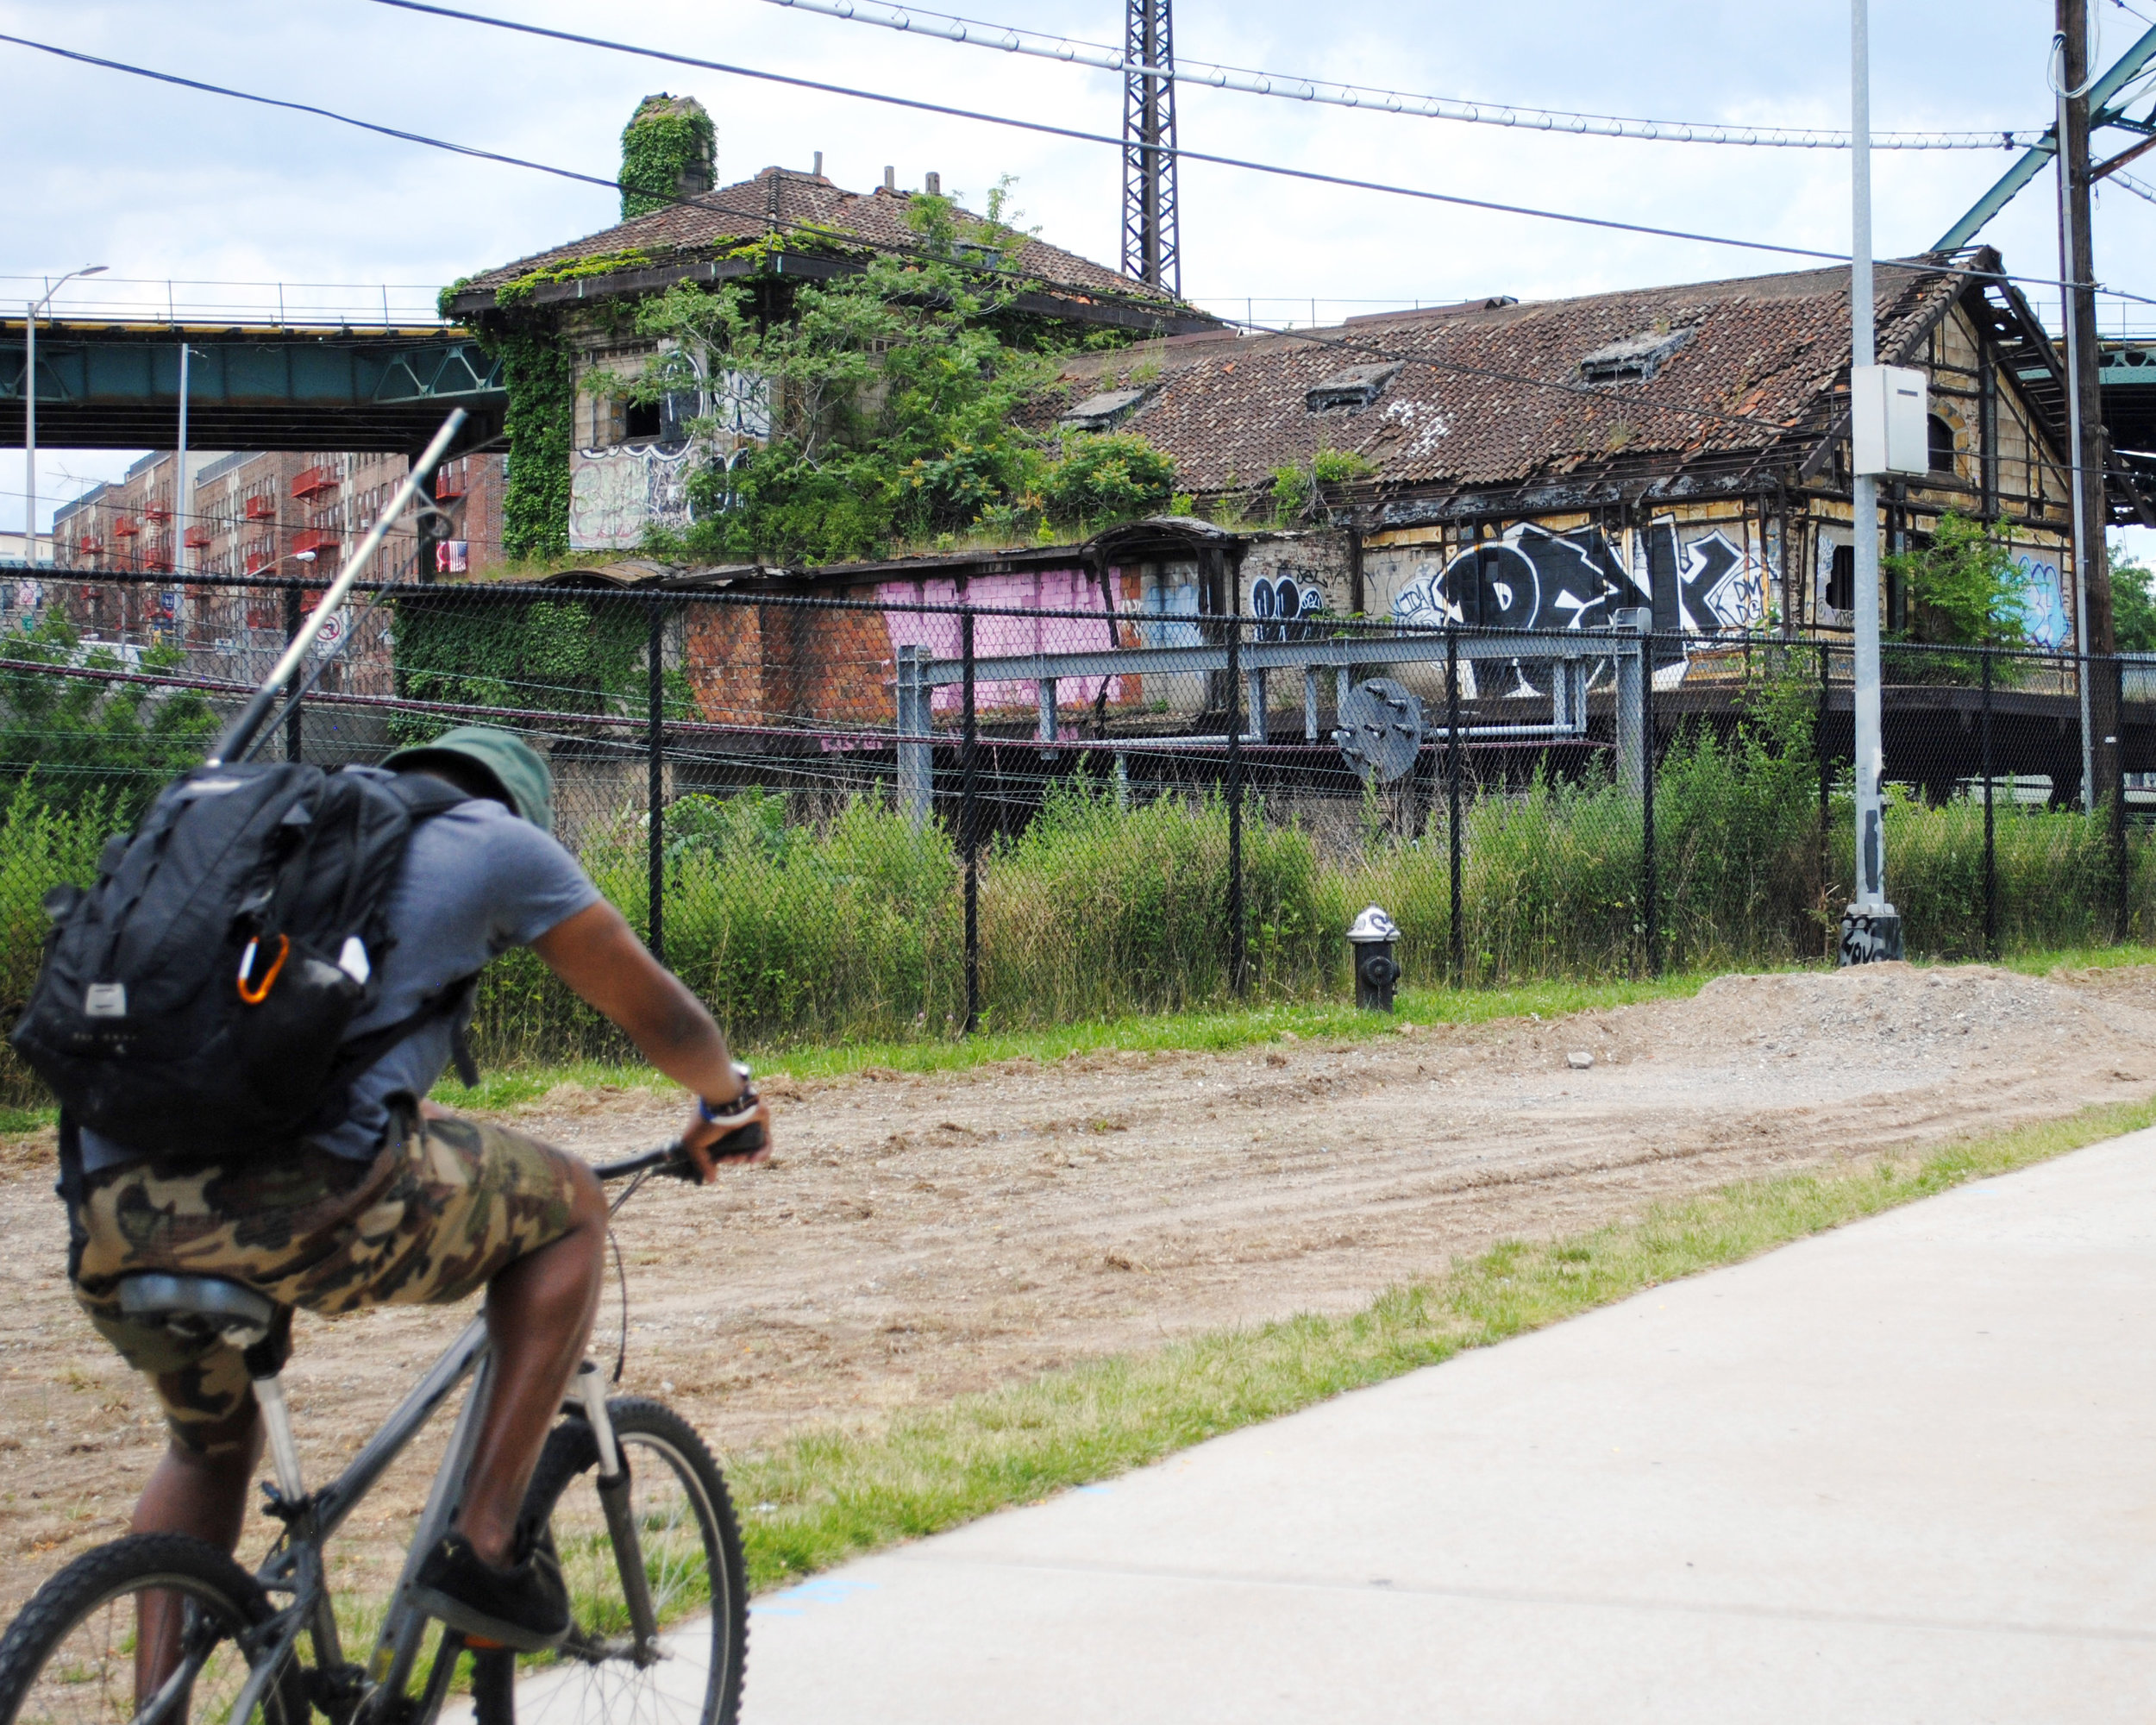 05 Concrete Plant Biker and Closed Graffiti Station 2017.jpg